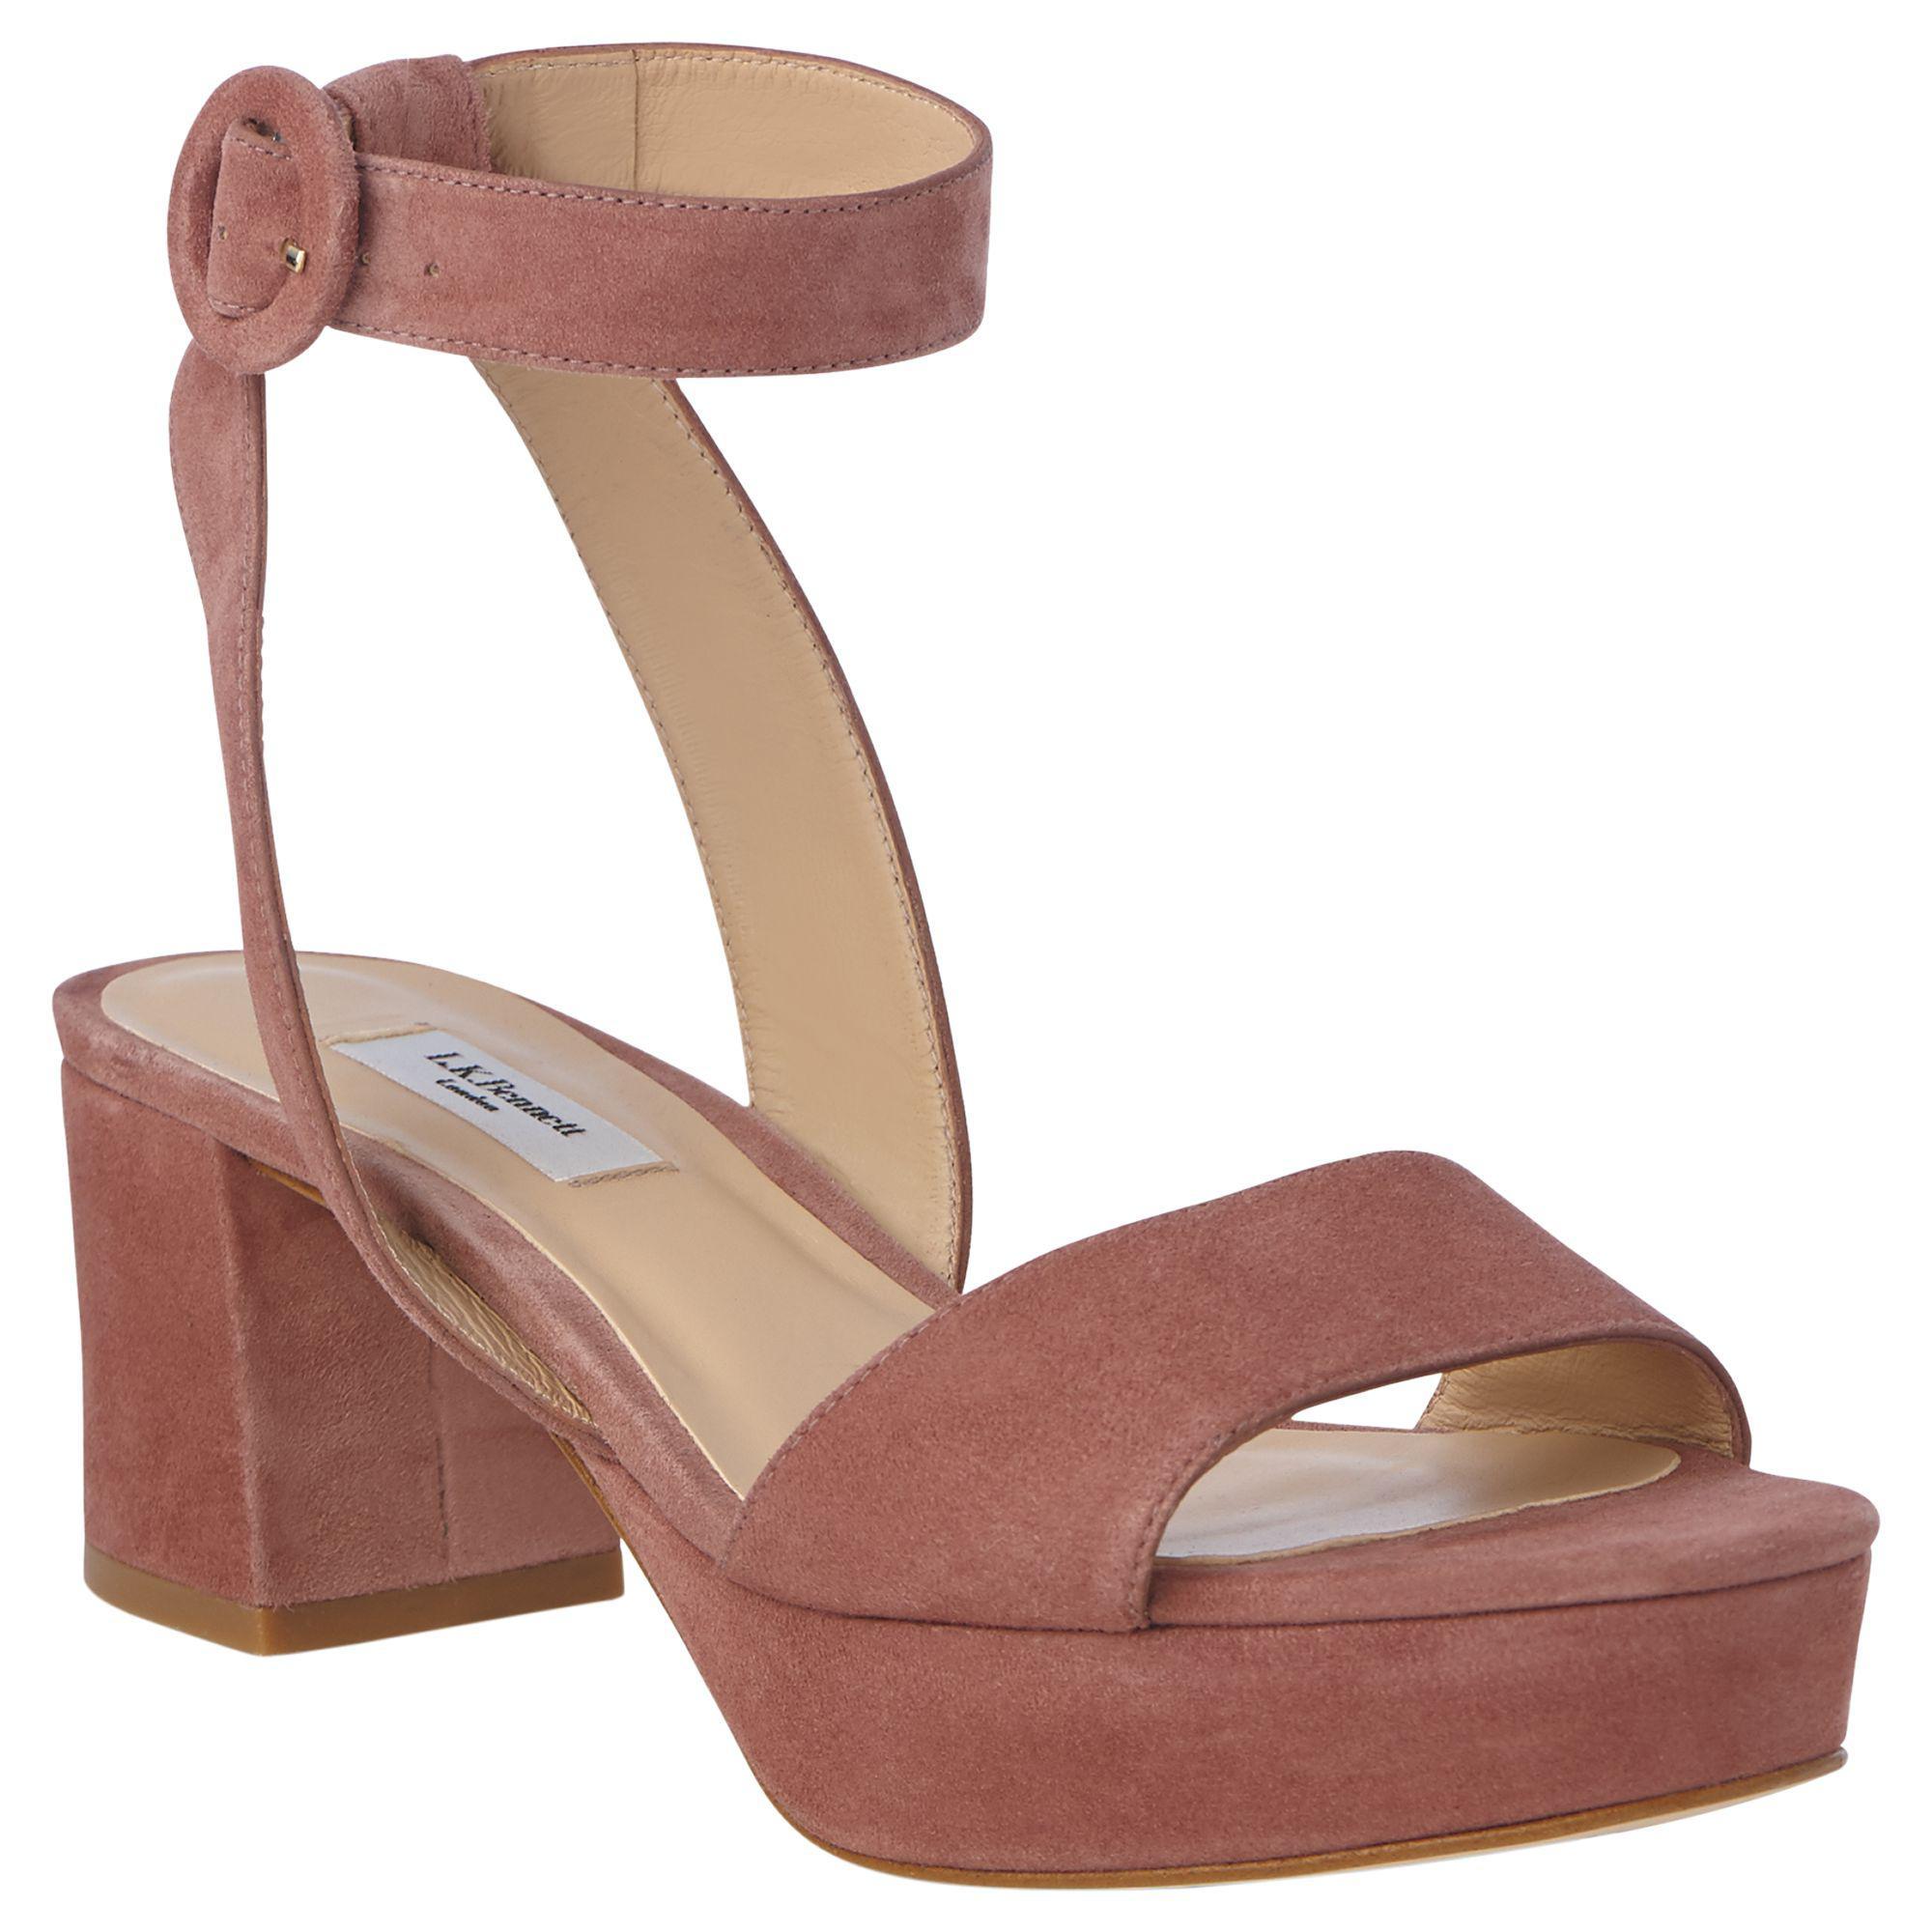 bc94c88fbd12 L.K.Bennett Alie Formal Sandals in Pink - Lyst